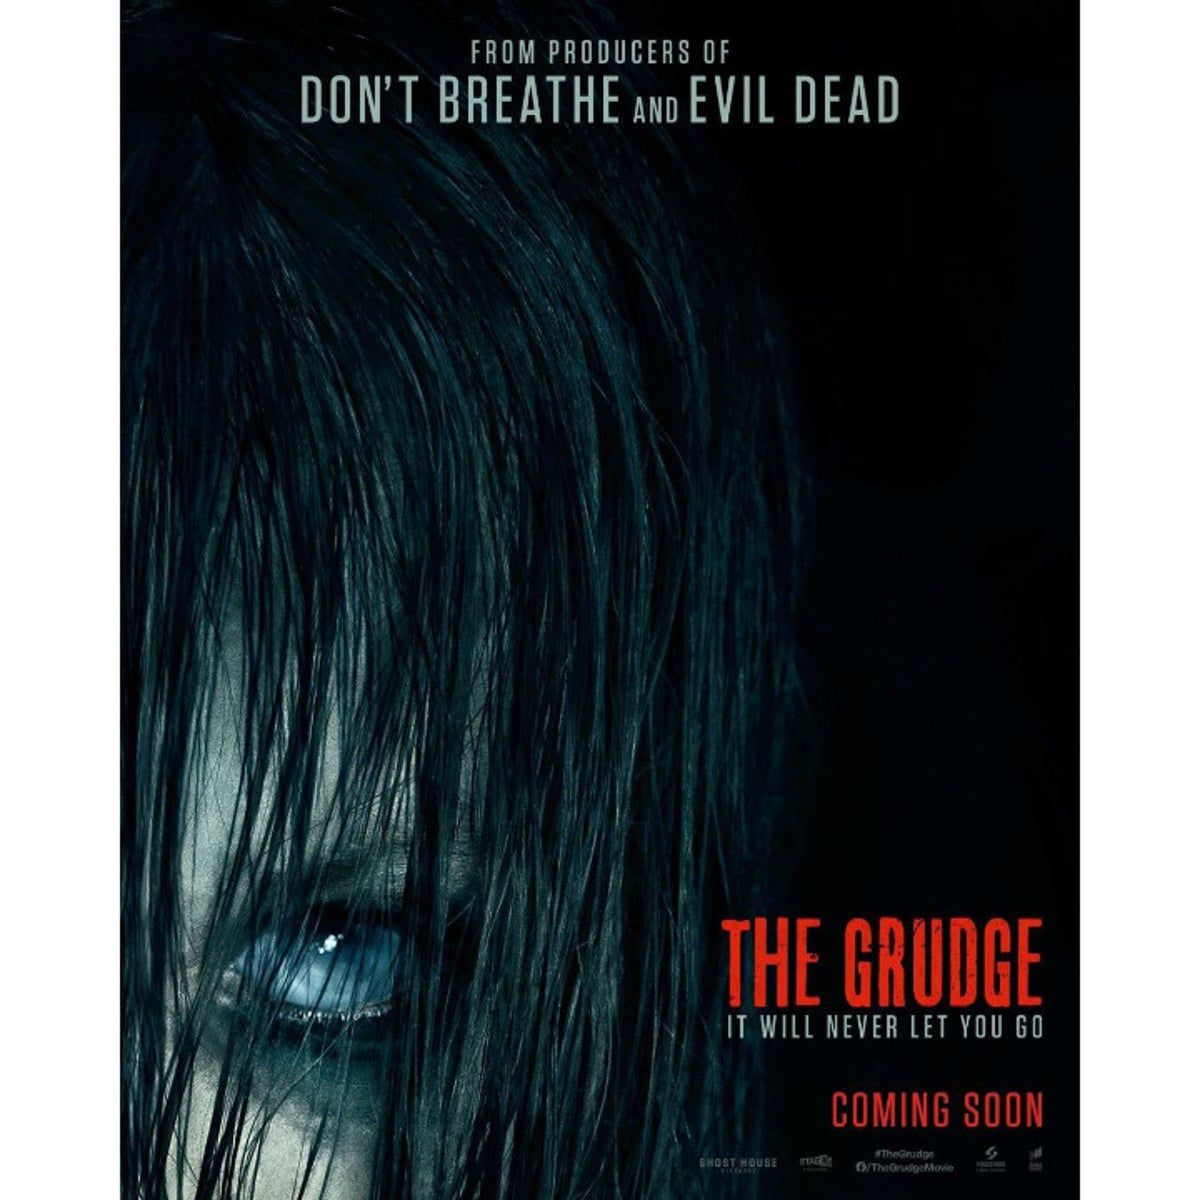 Poster The Grudge 2020 Remake 呪怨 ポスター ハリウッド